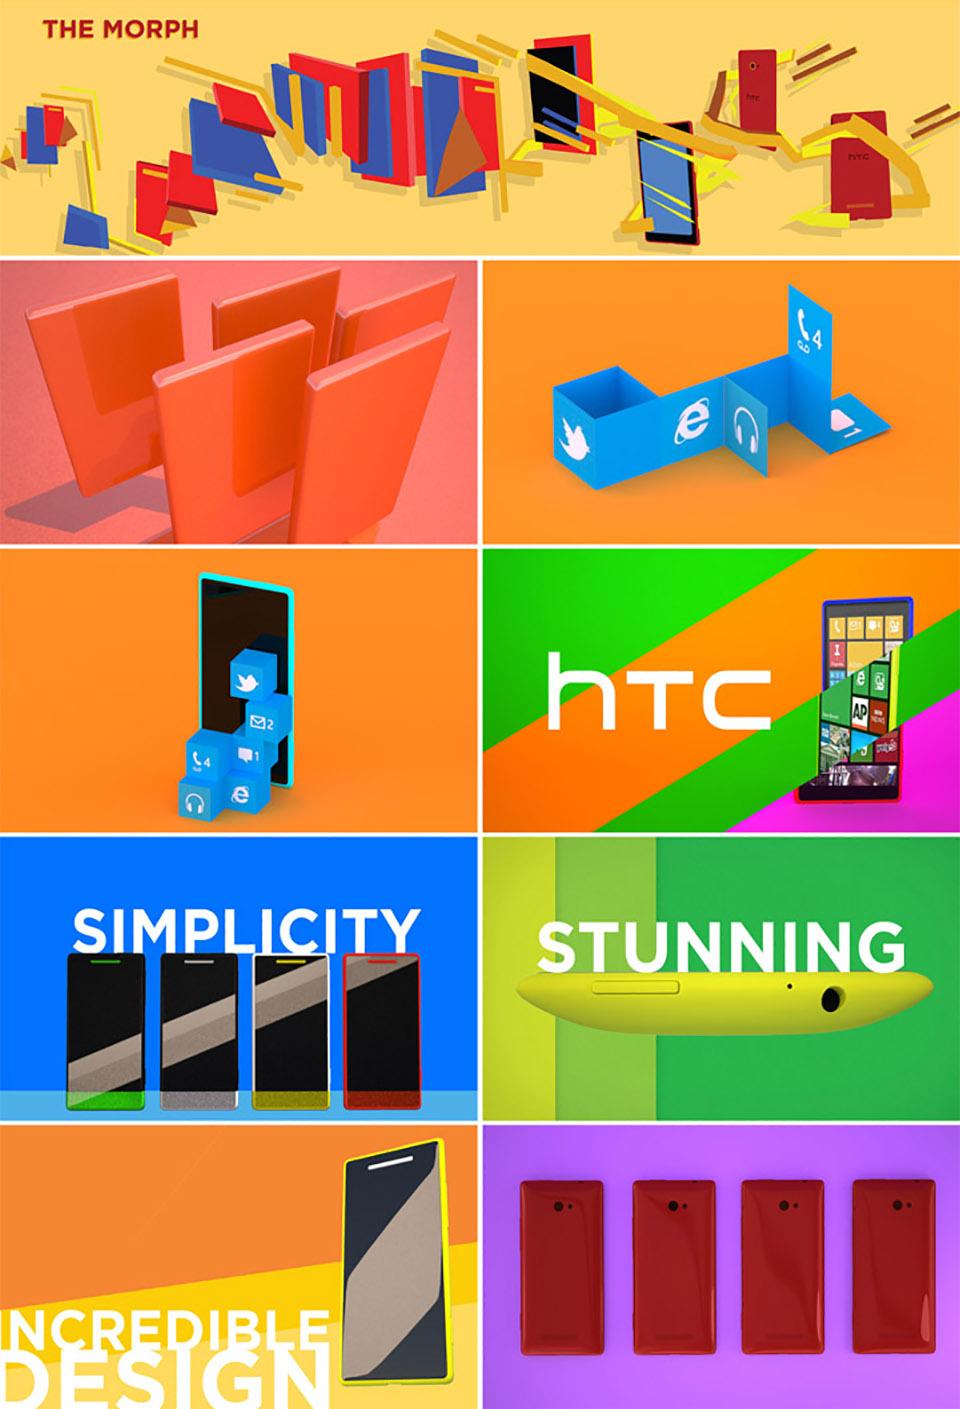 htcquotcolorsquot_styleframes2.jpg